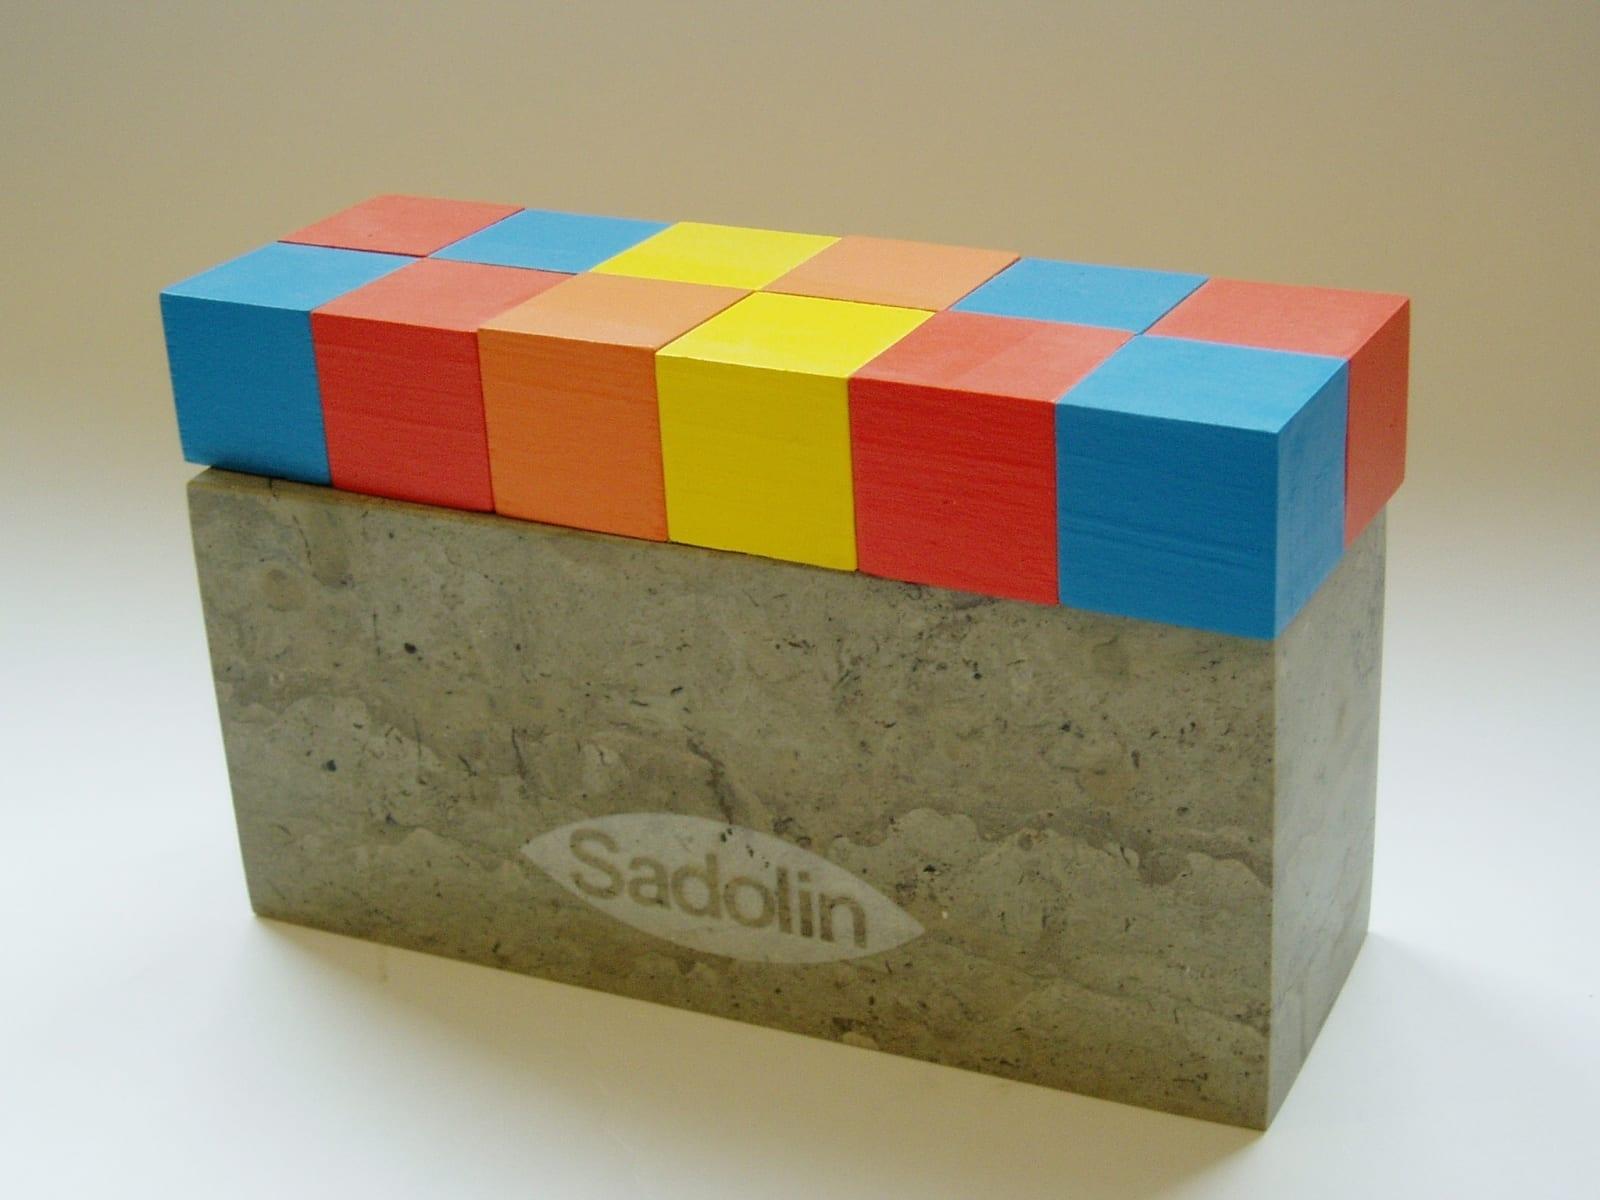 SADOLIN 2001 paekivi, puu  <br/>For SADOLIN 2001 wood, limestone